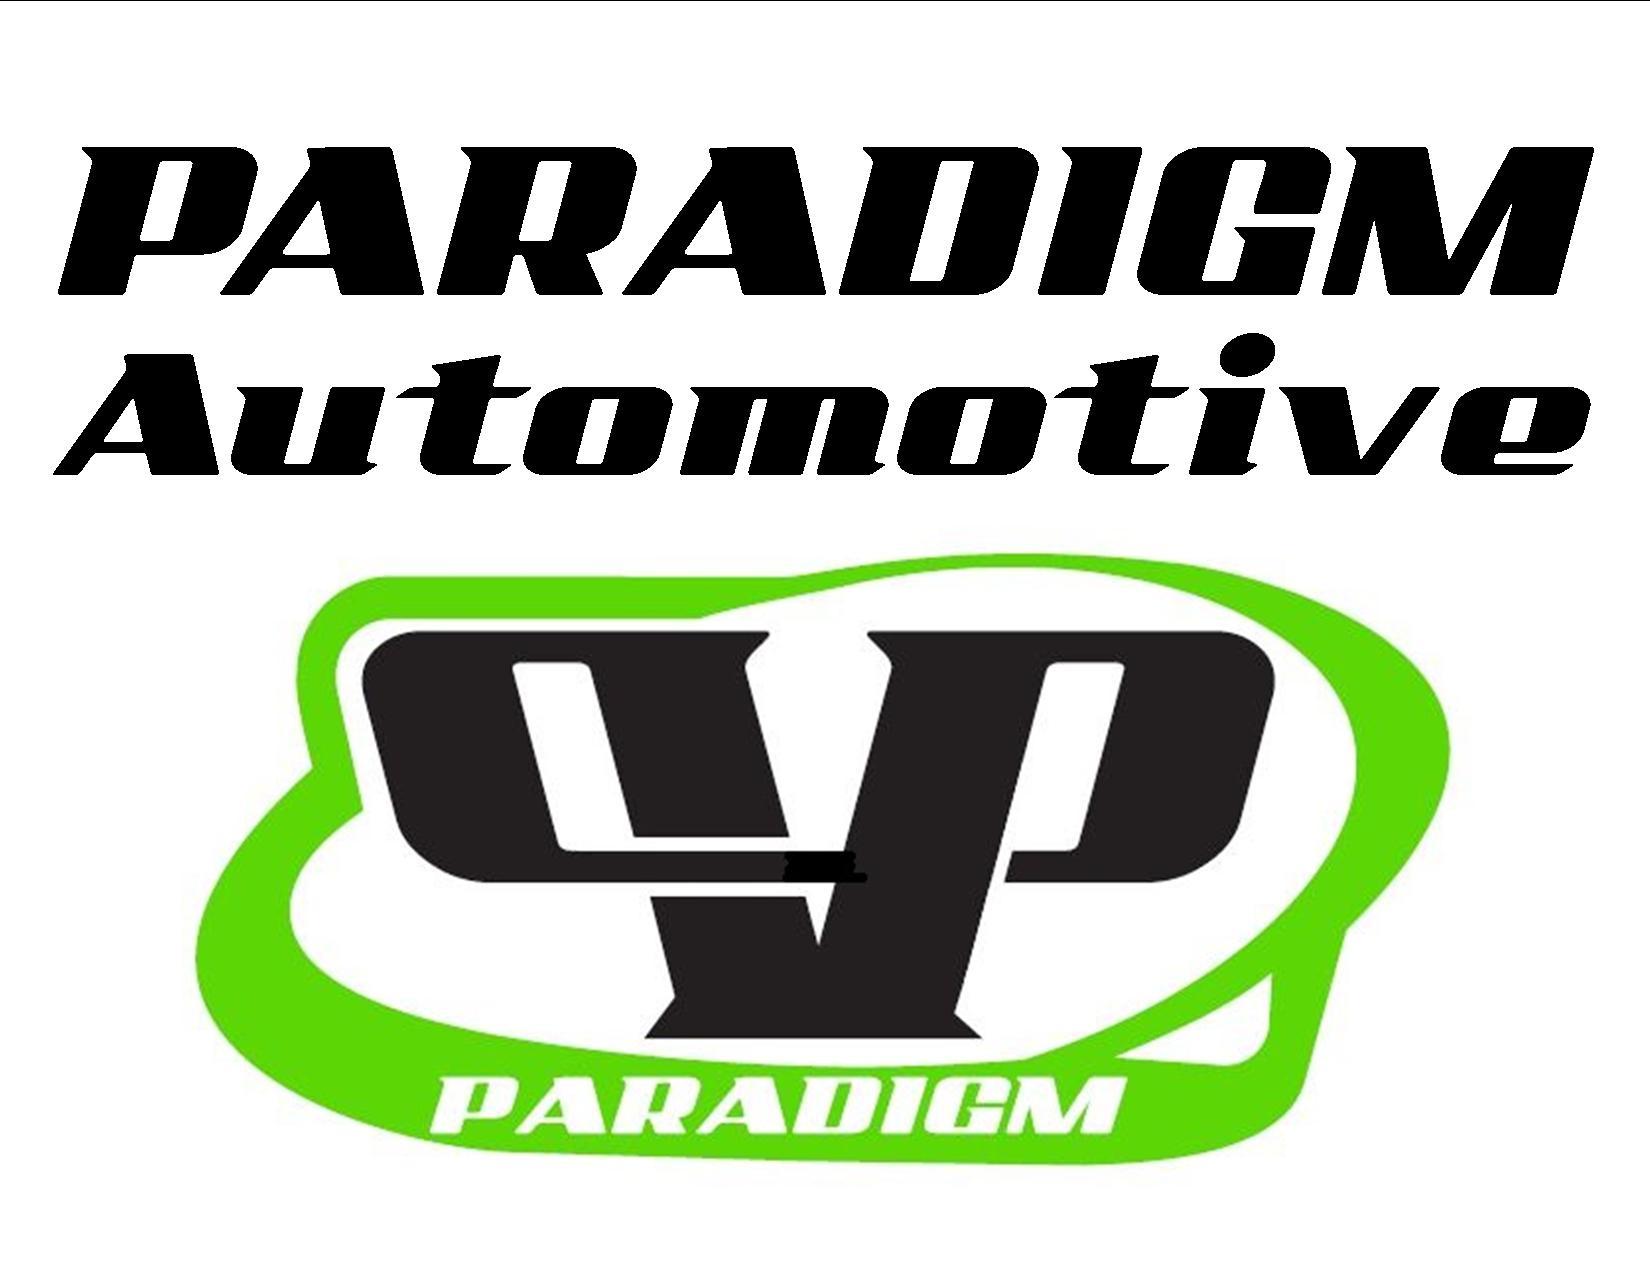 Paradigm Automotive